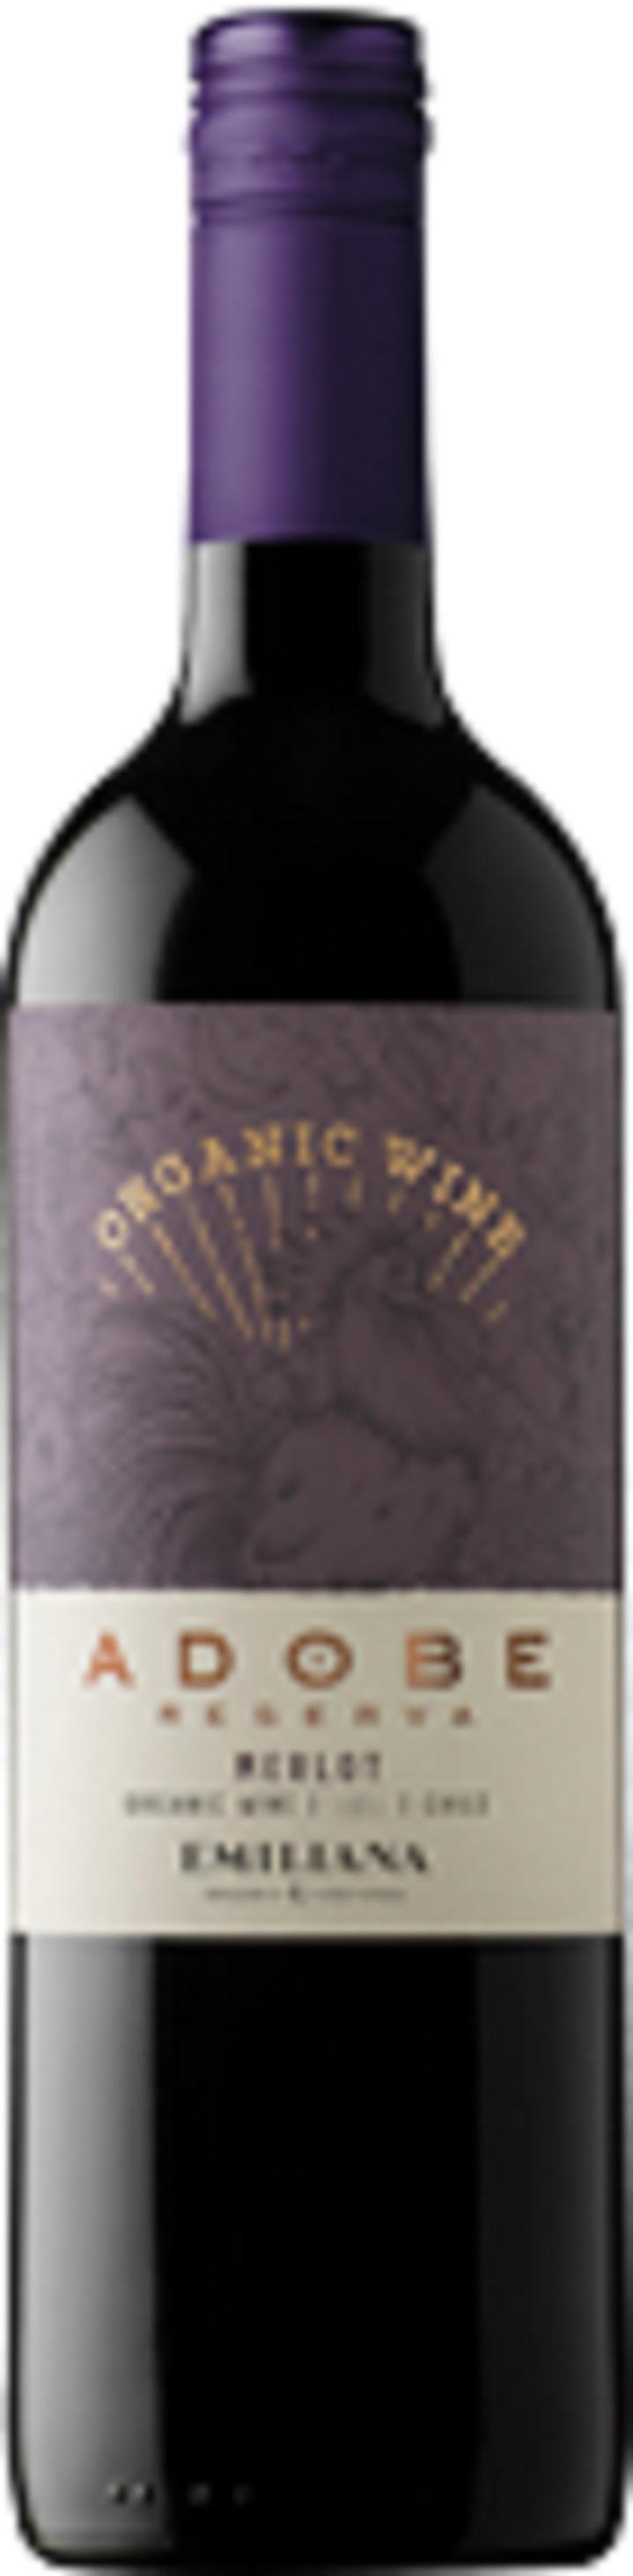 adobe-organic-reserva-merlot